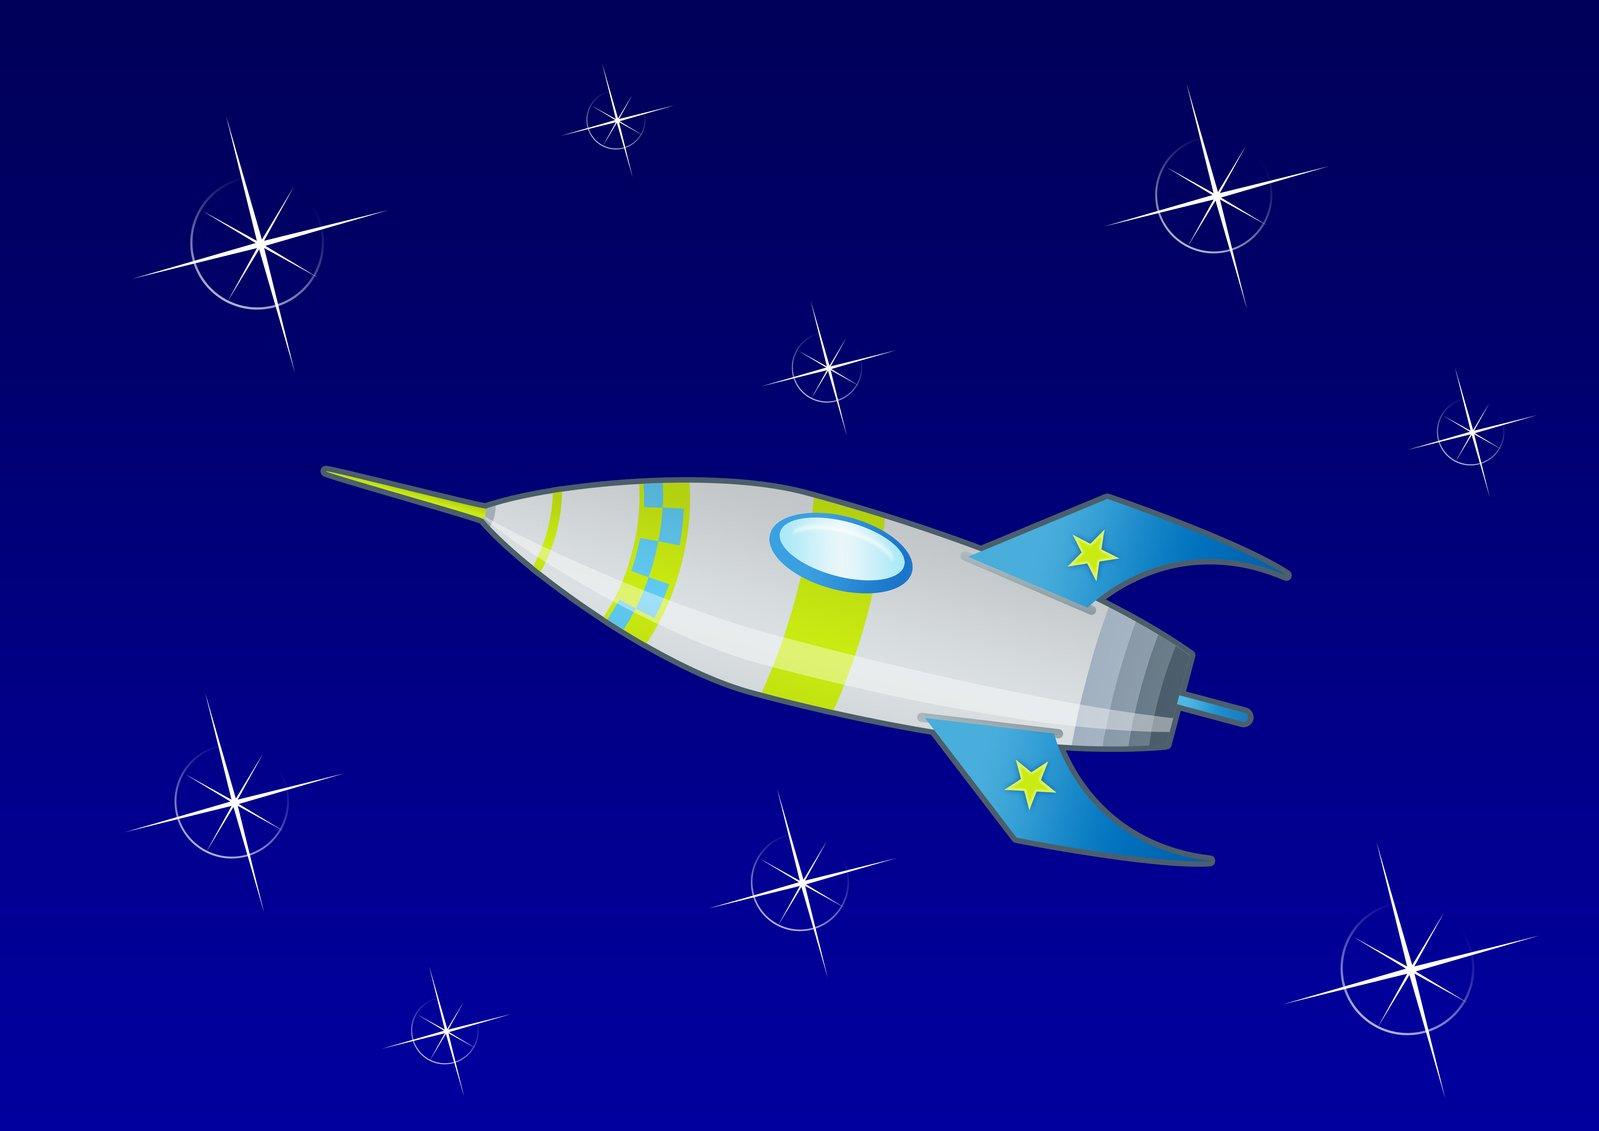 Free SpaceRocket Stock Photo